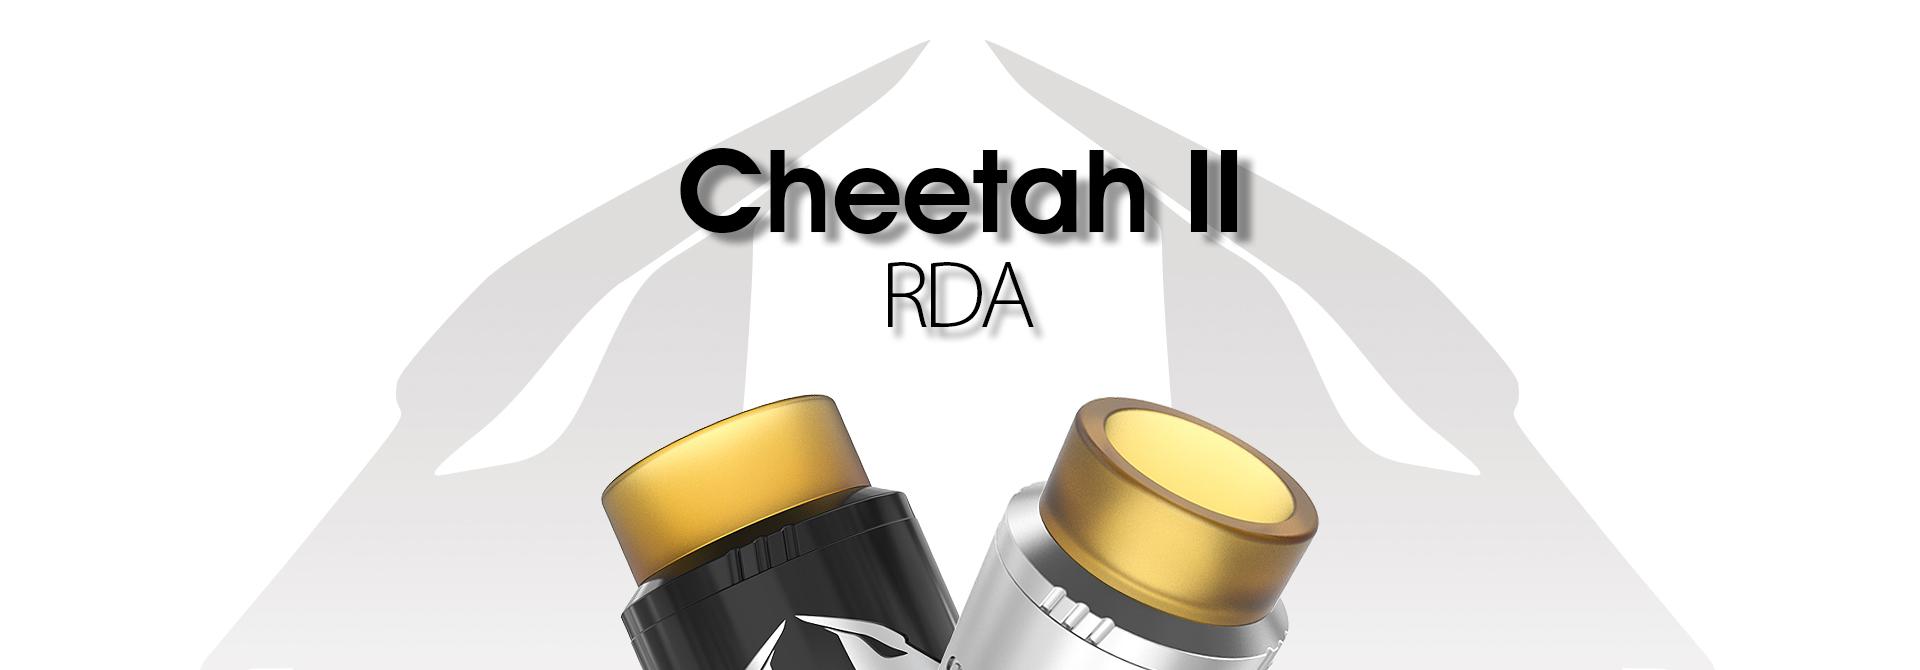 Atomizador Cheetah II RDA - OBS